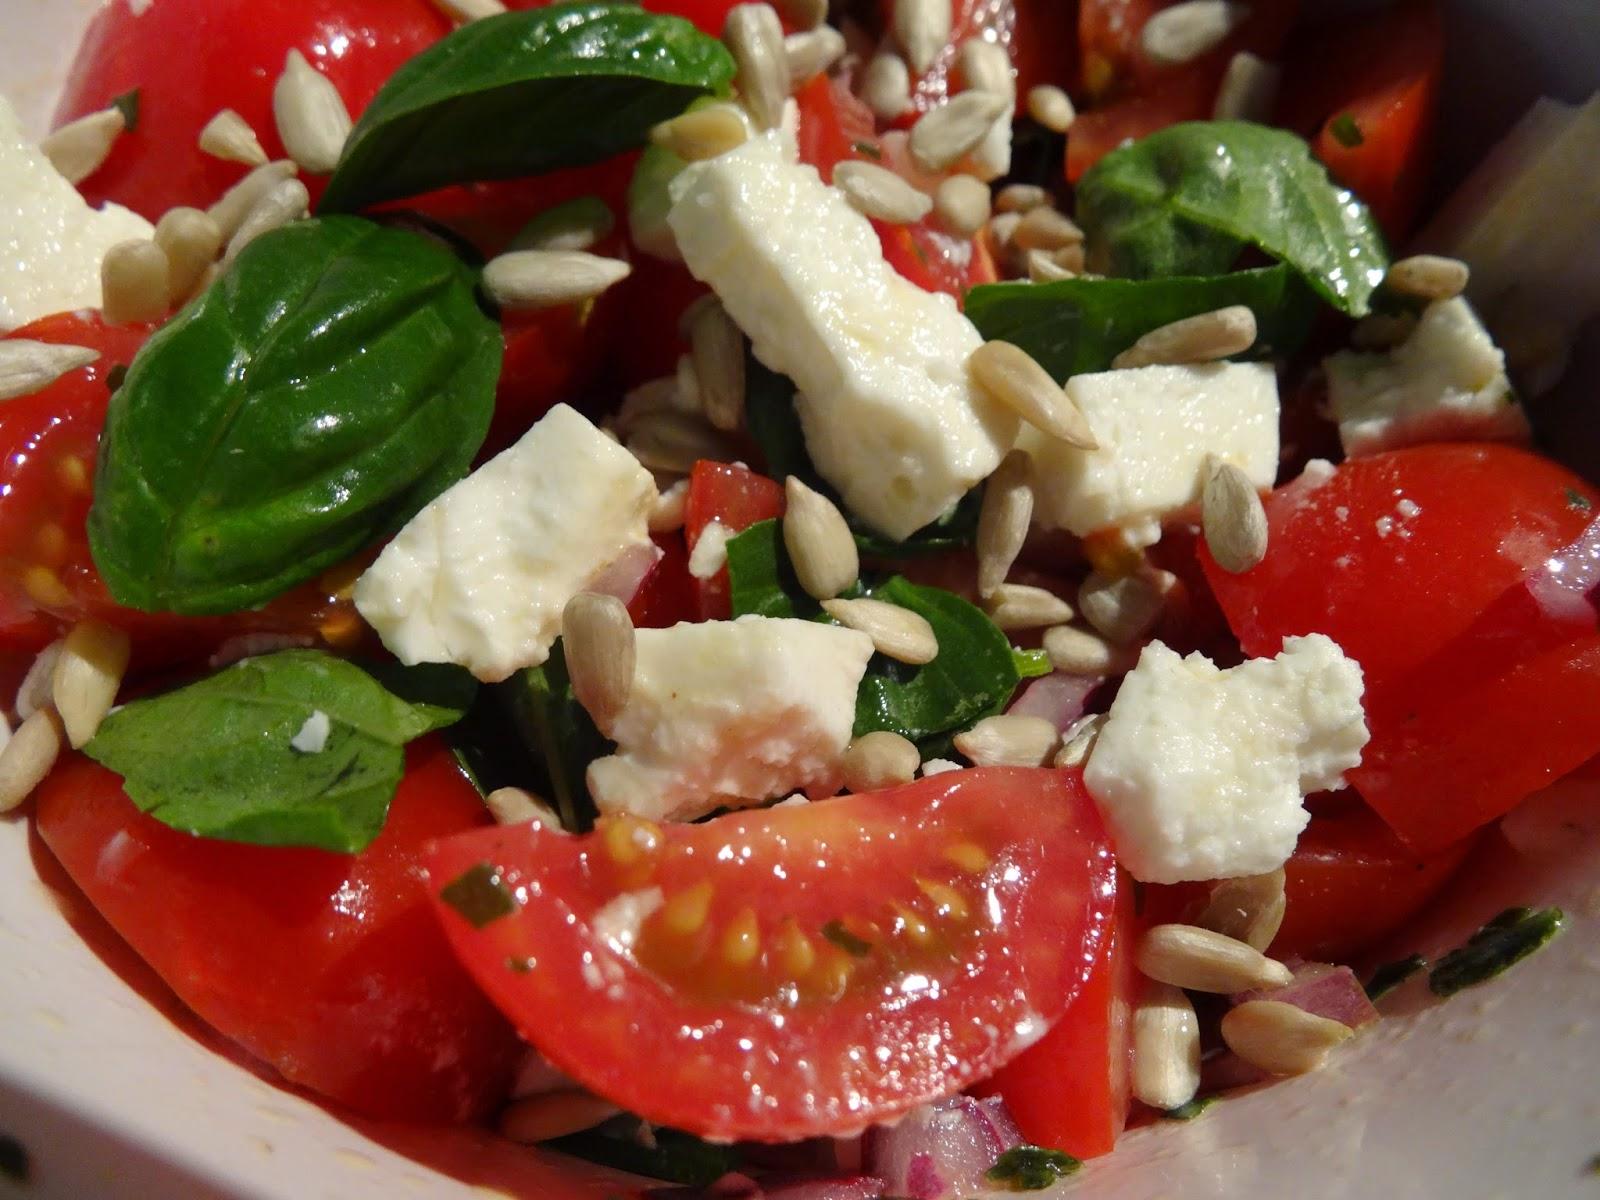 Low Carb: Leichter Tomatensalat mit Feta und Basilikum